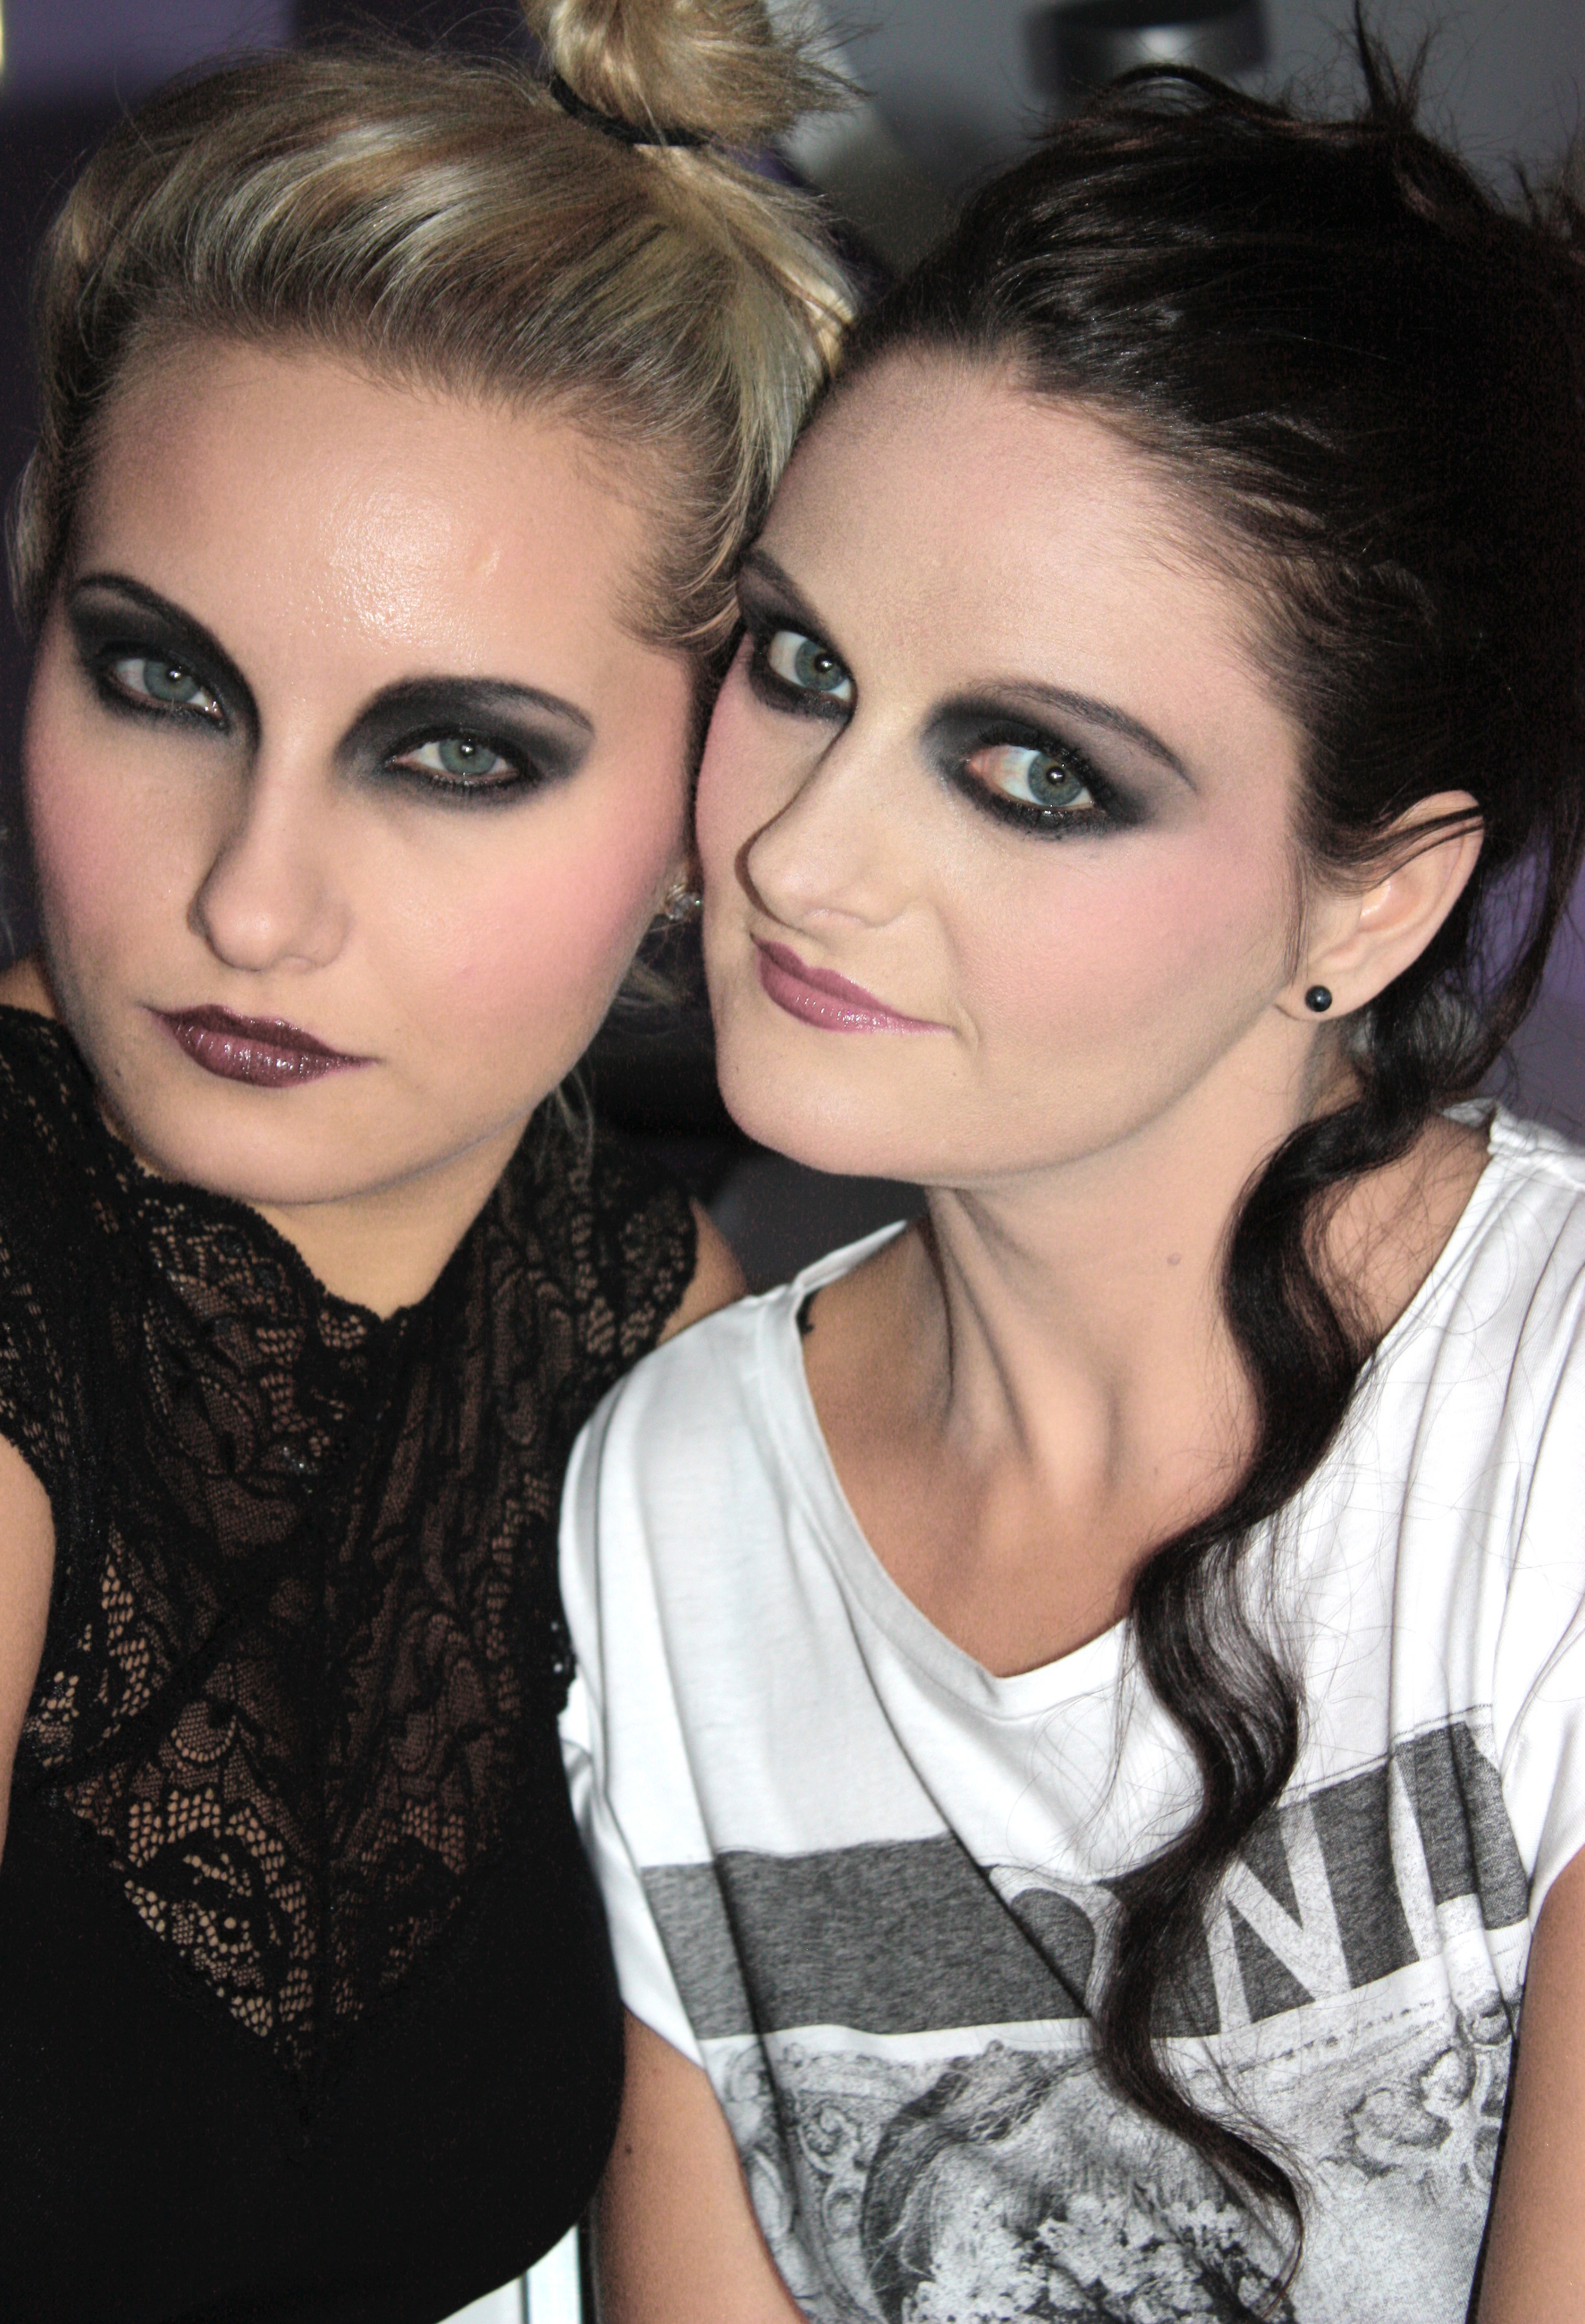 DIOR inspired makeup